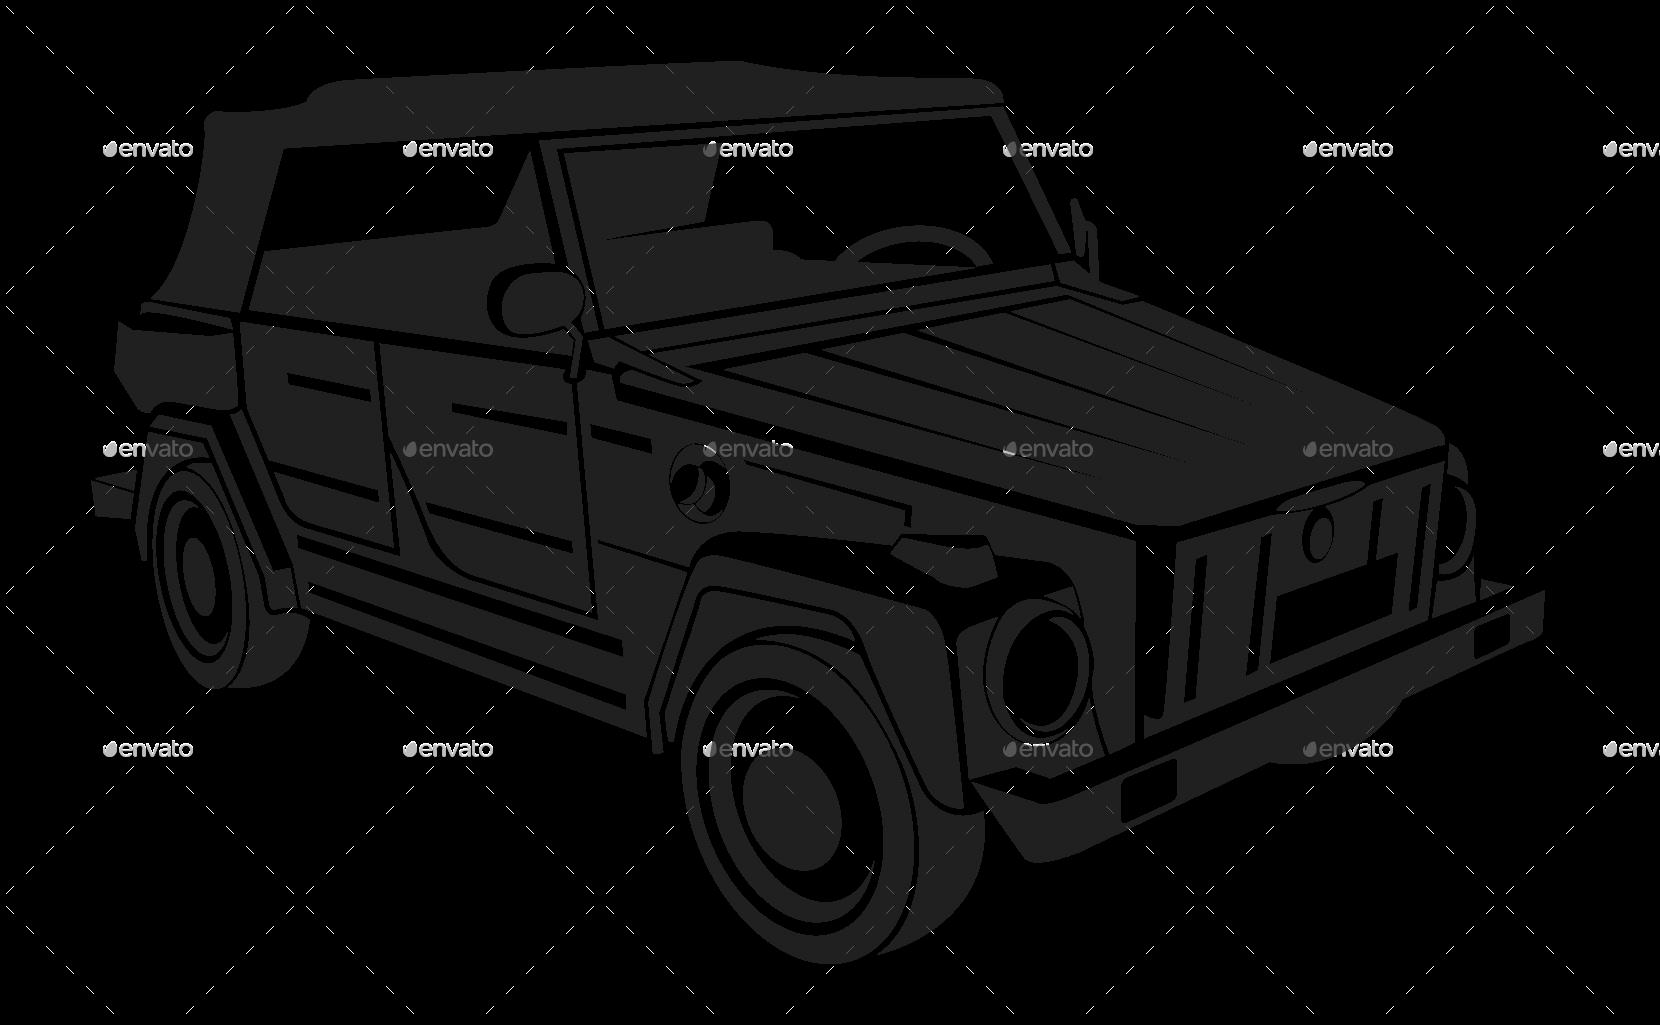 Vw Silhouette Car Set By Vectorio Graphicriver